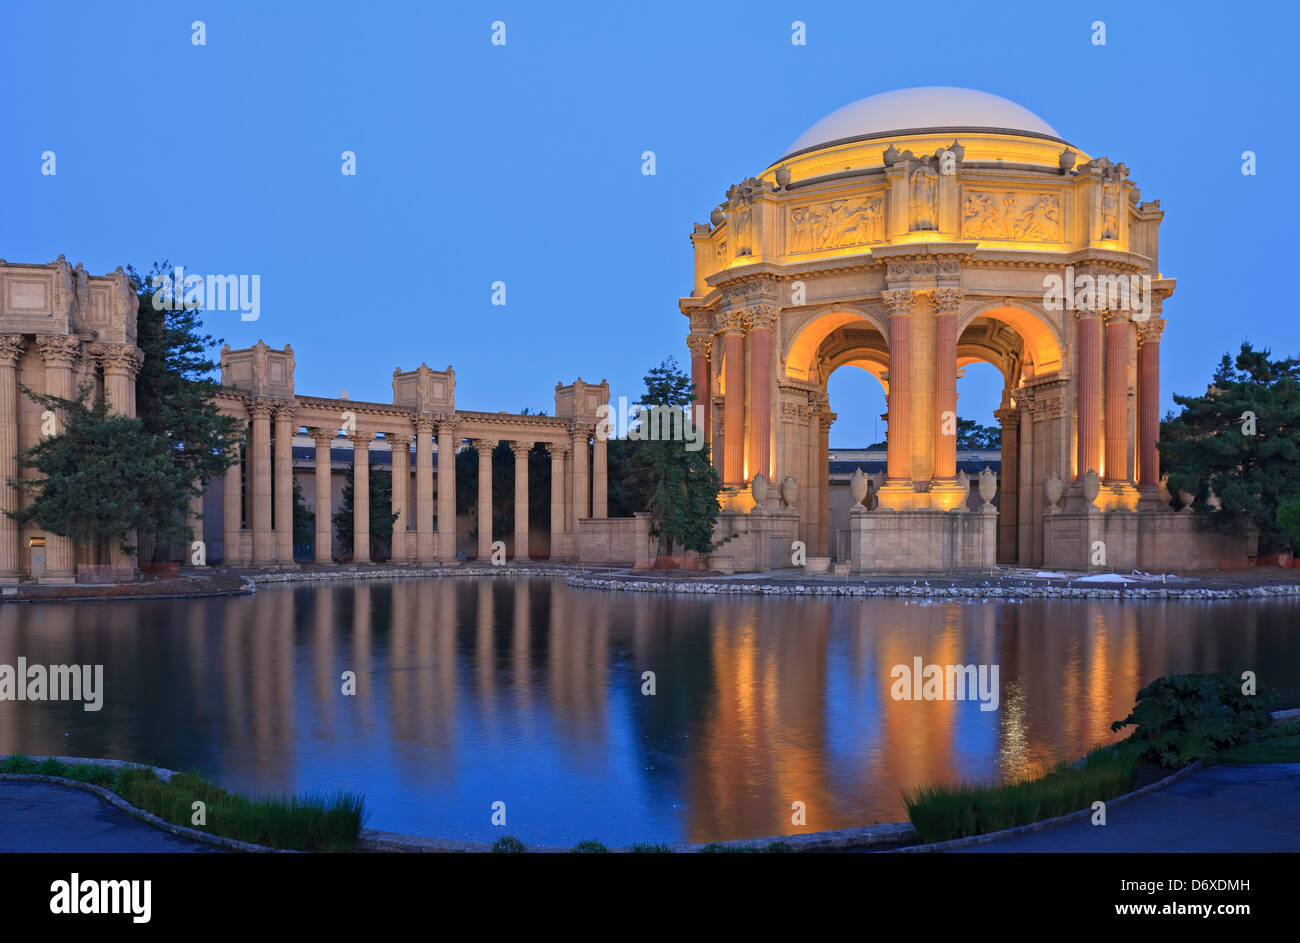 Palace of Fine Arts et Exploratorium au crépuscule, San Francisco, California USA Photo Stock